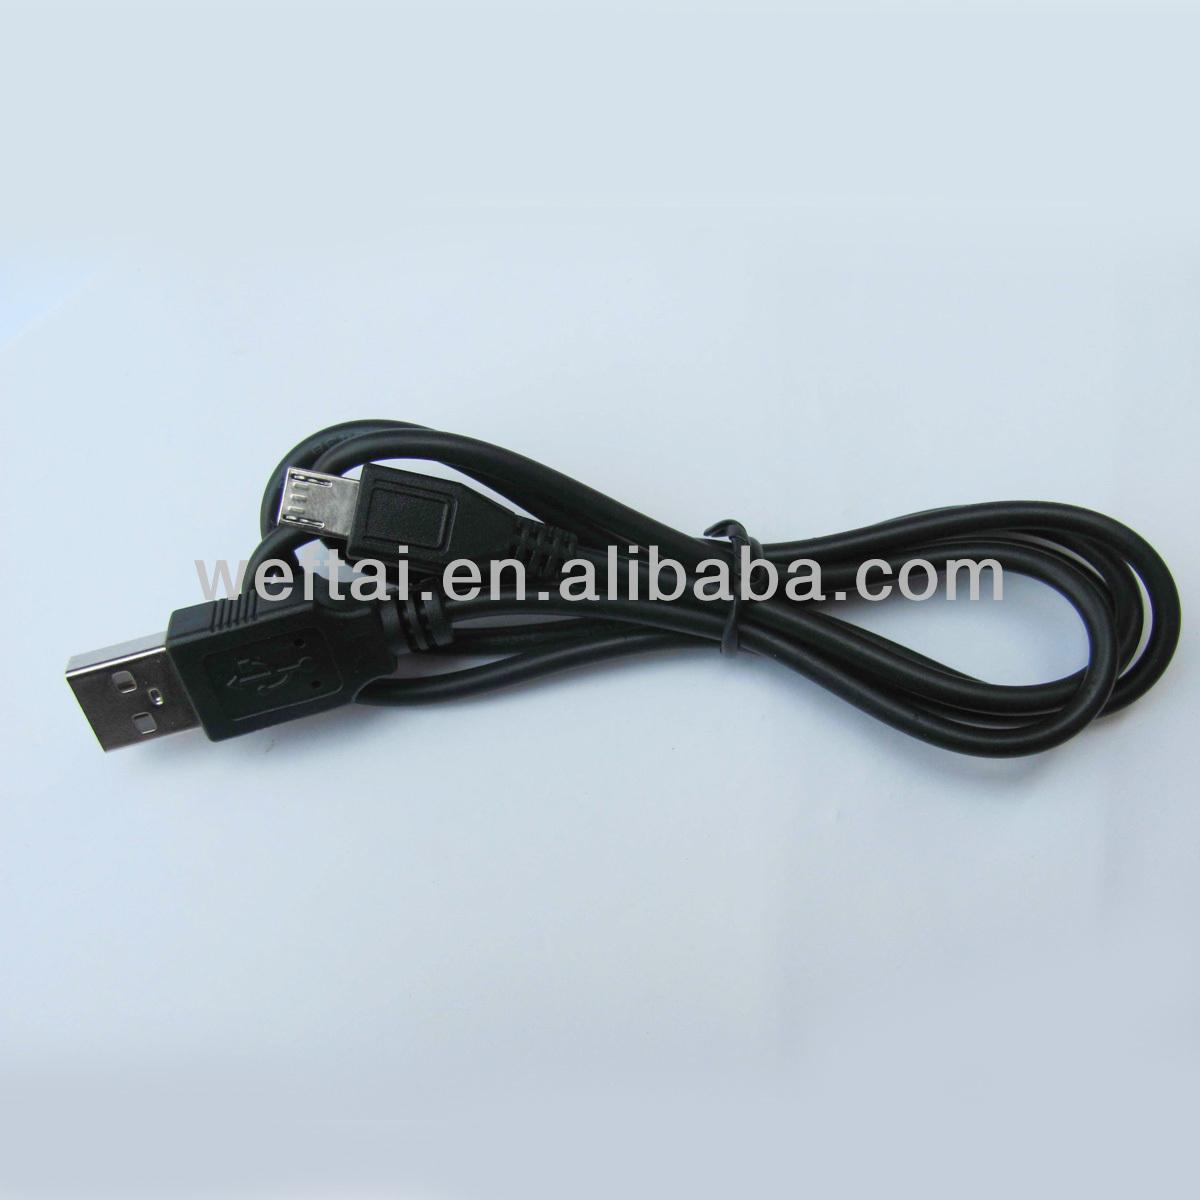 Catlogo De Fabricantes Cable Plc Mitsubishi Alta Calidad Y Usb Sc09 Fx En Alibabacom